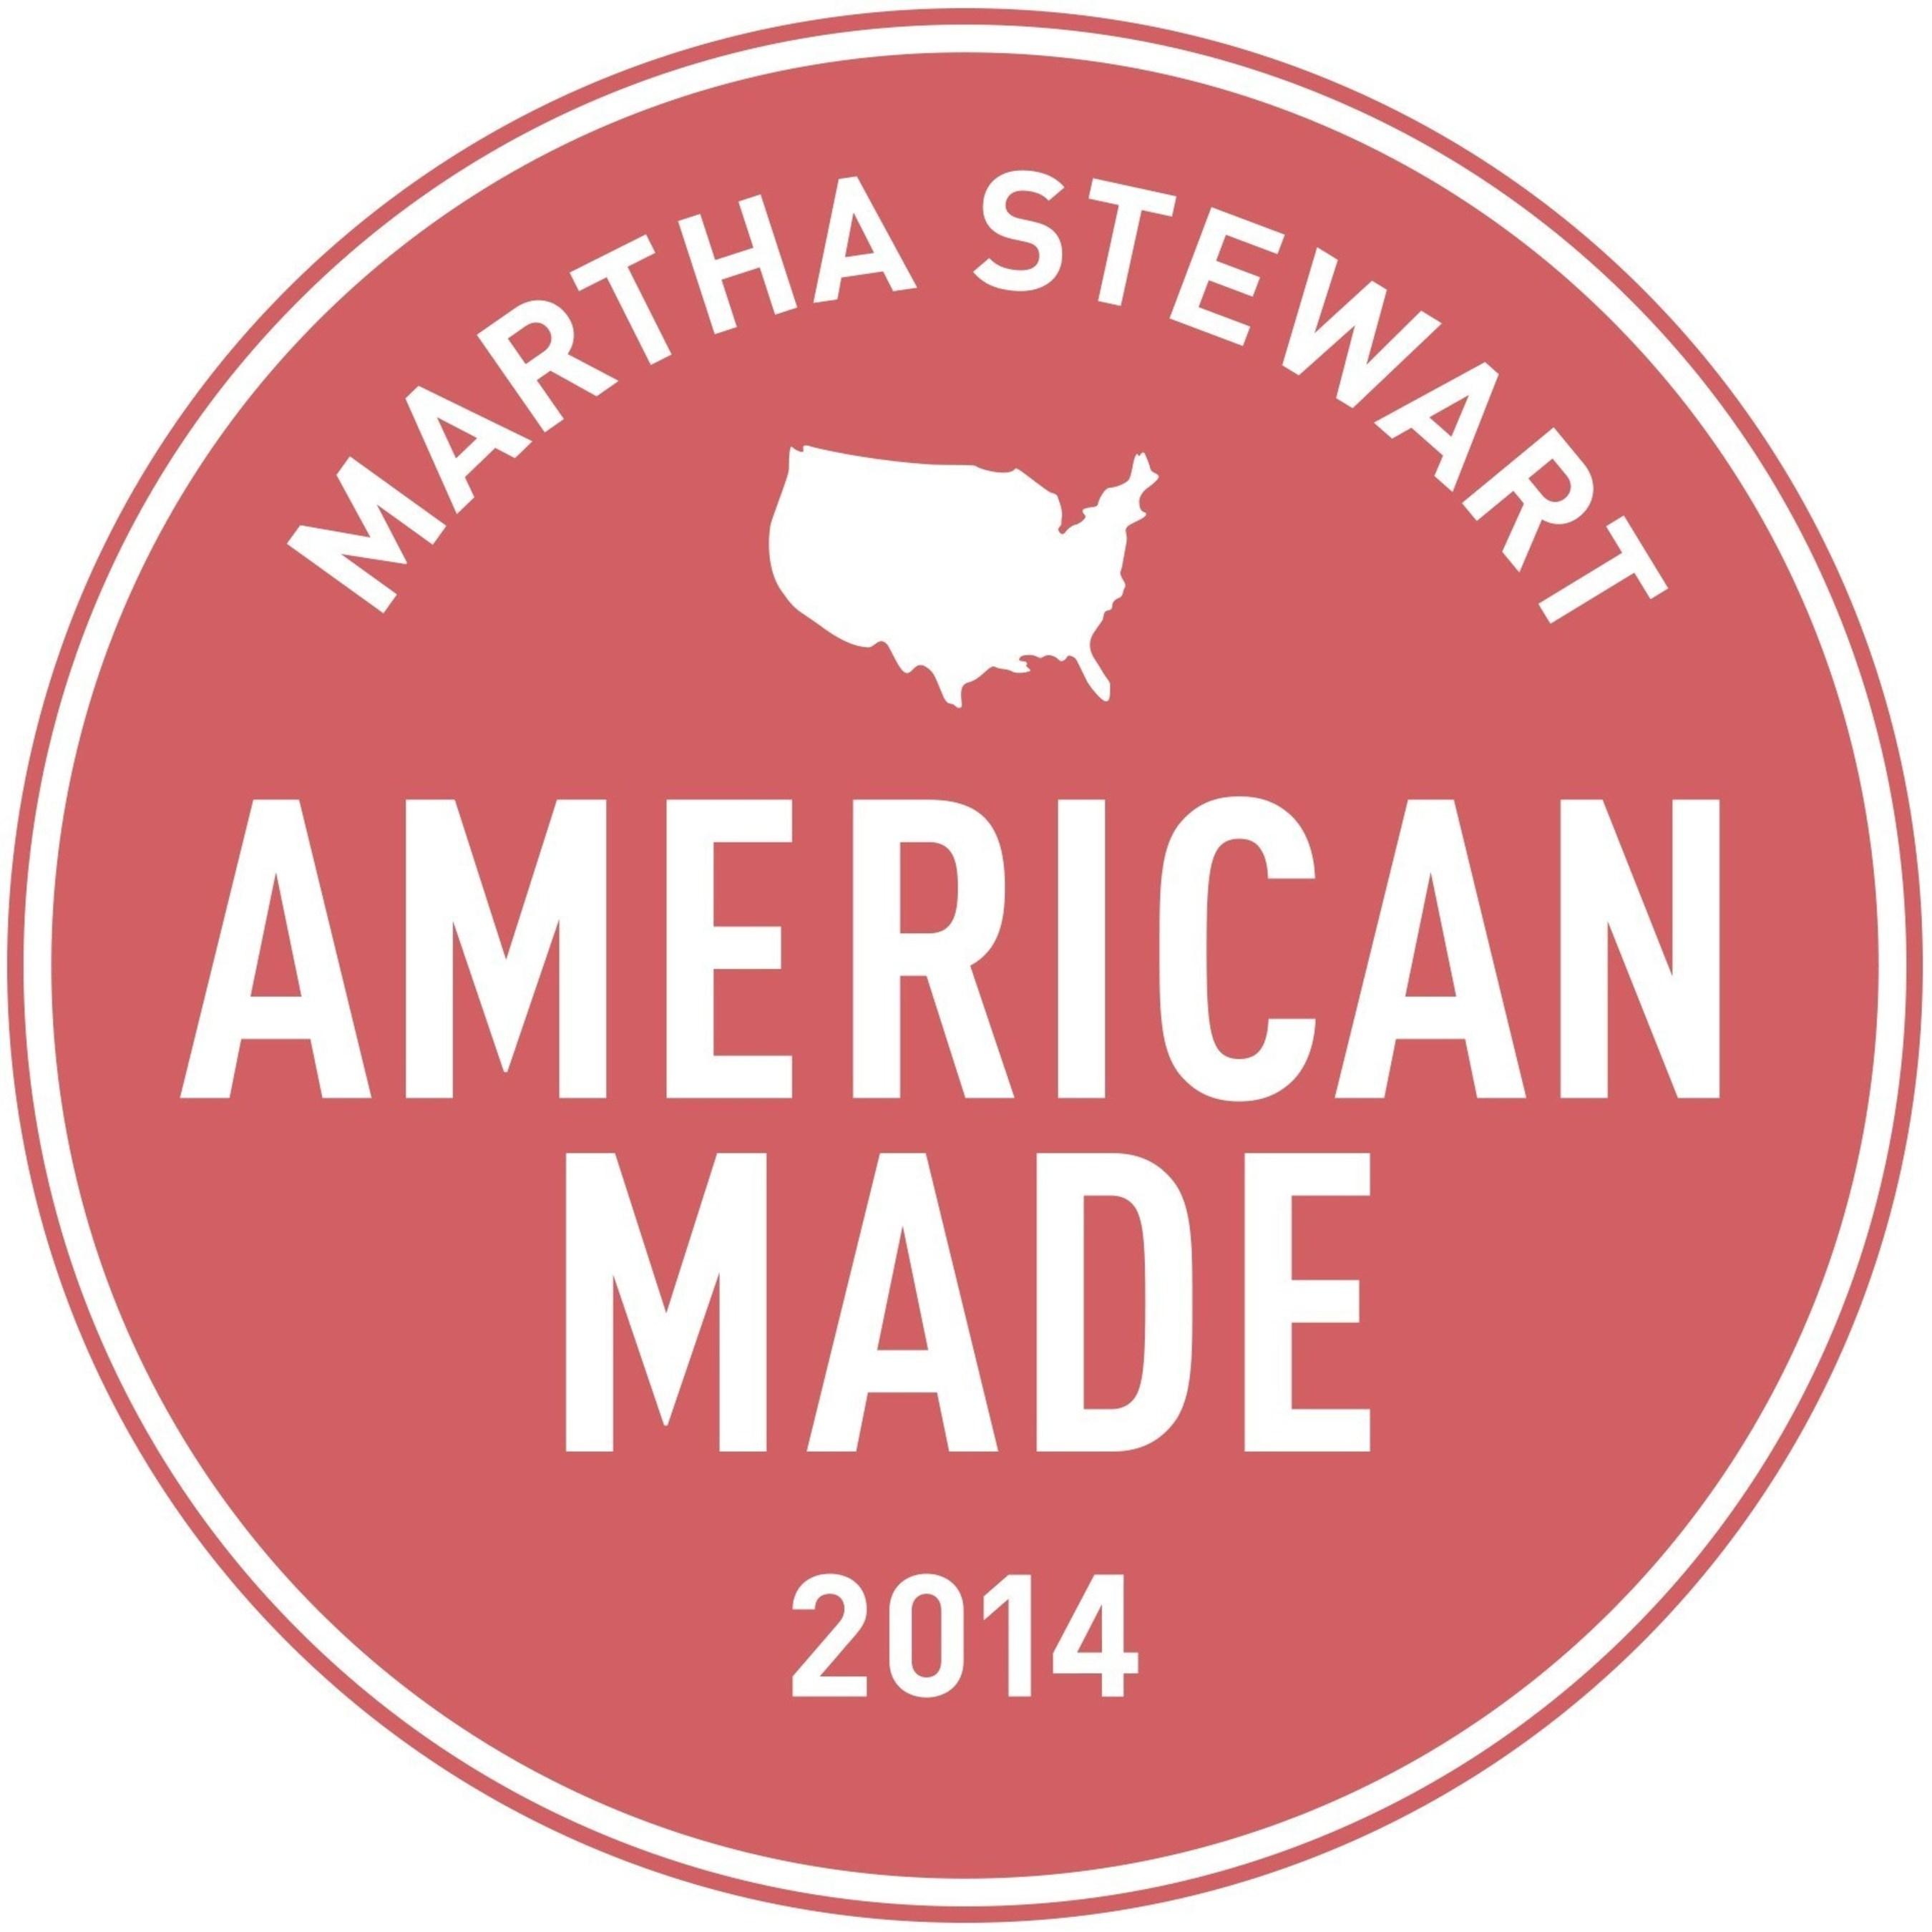 Martha Stewart American Made 2014 Logo